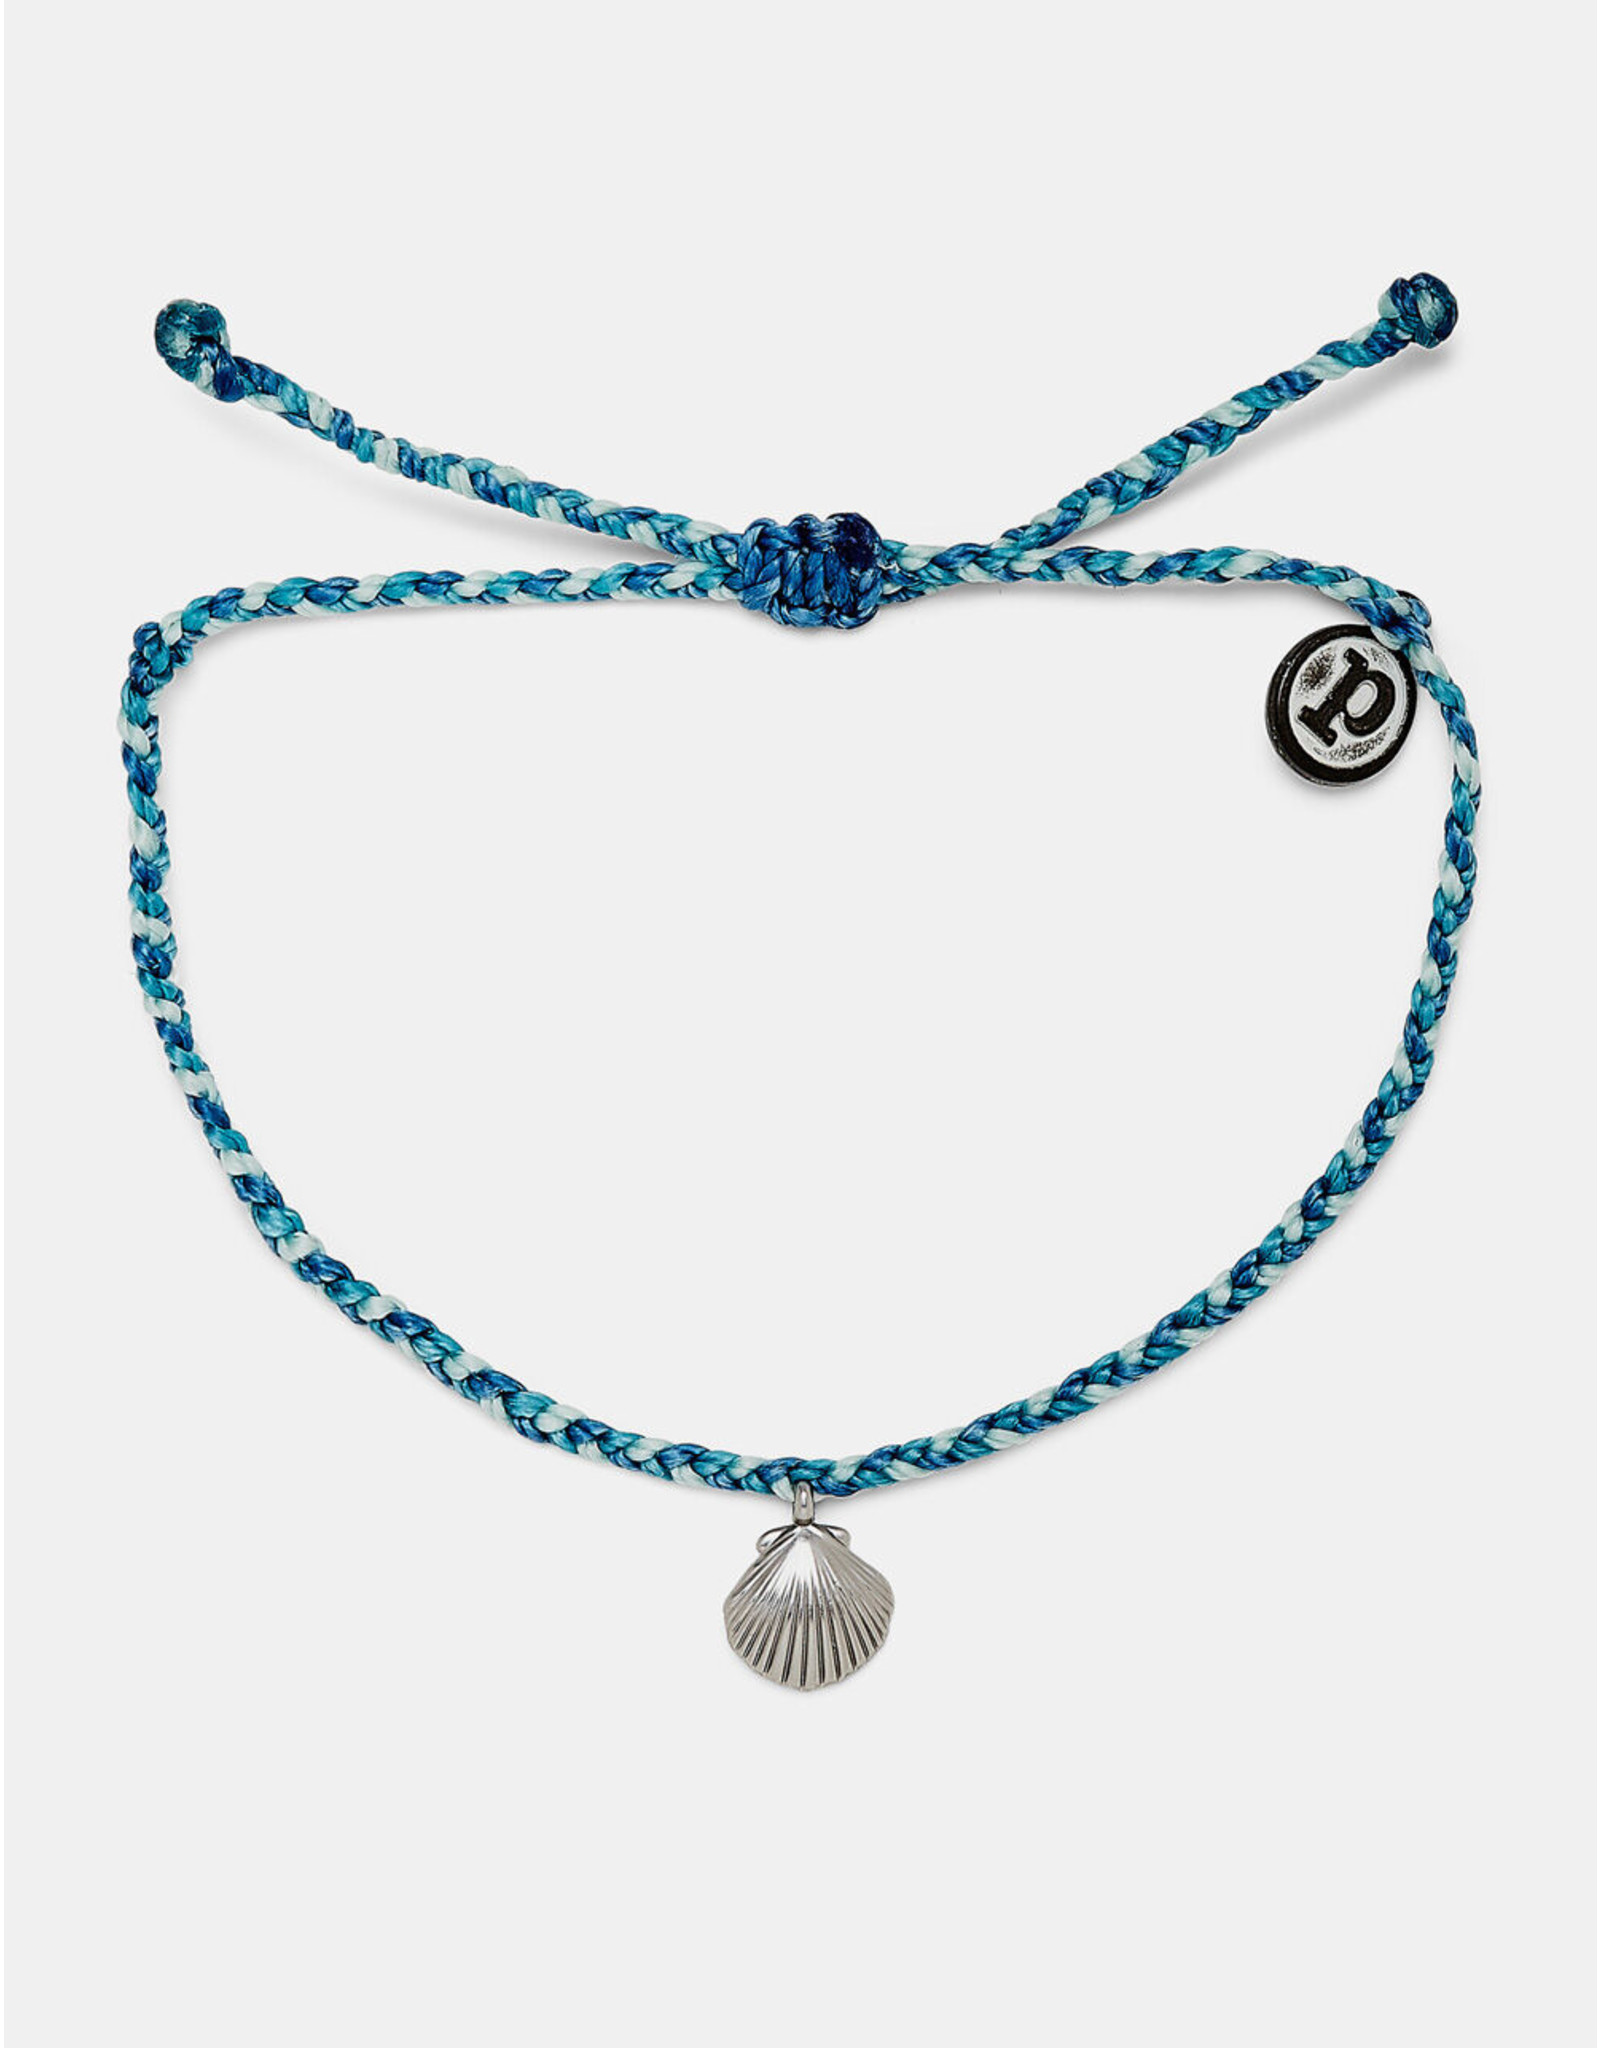 Pura Vida La concha Silver Bracelet, Blue